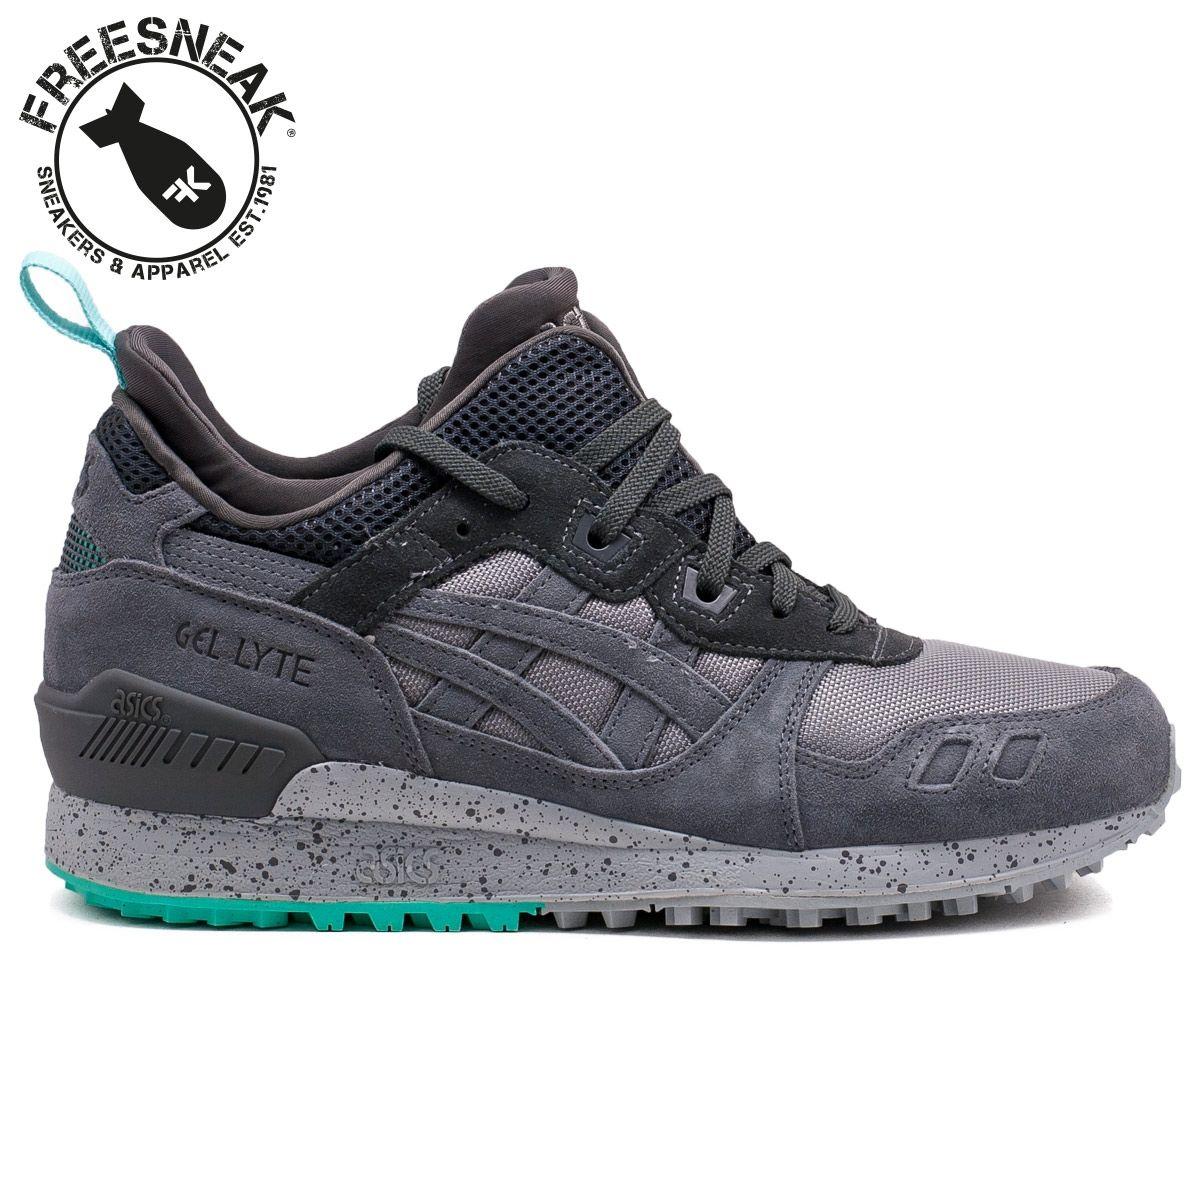 UK Shoes - NEW asics Gel-Lyte MT Shoes Mens Sneakers Sneakers Sport Grey HL6G0 1111 Grey